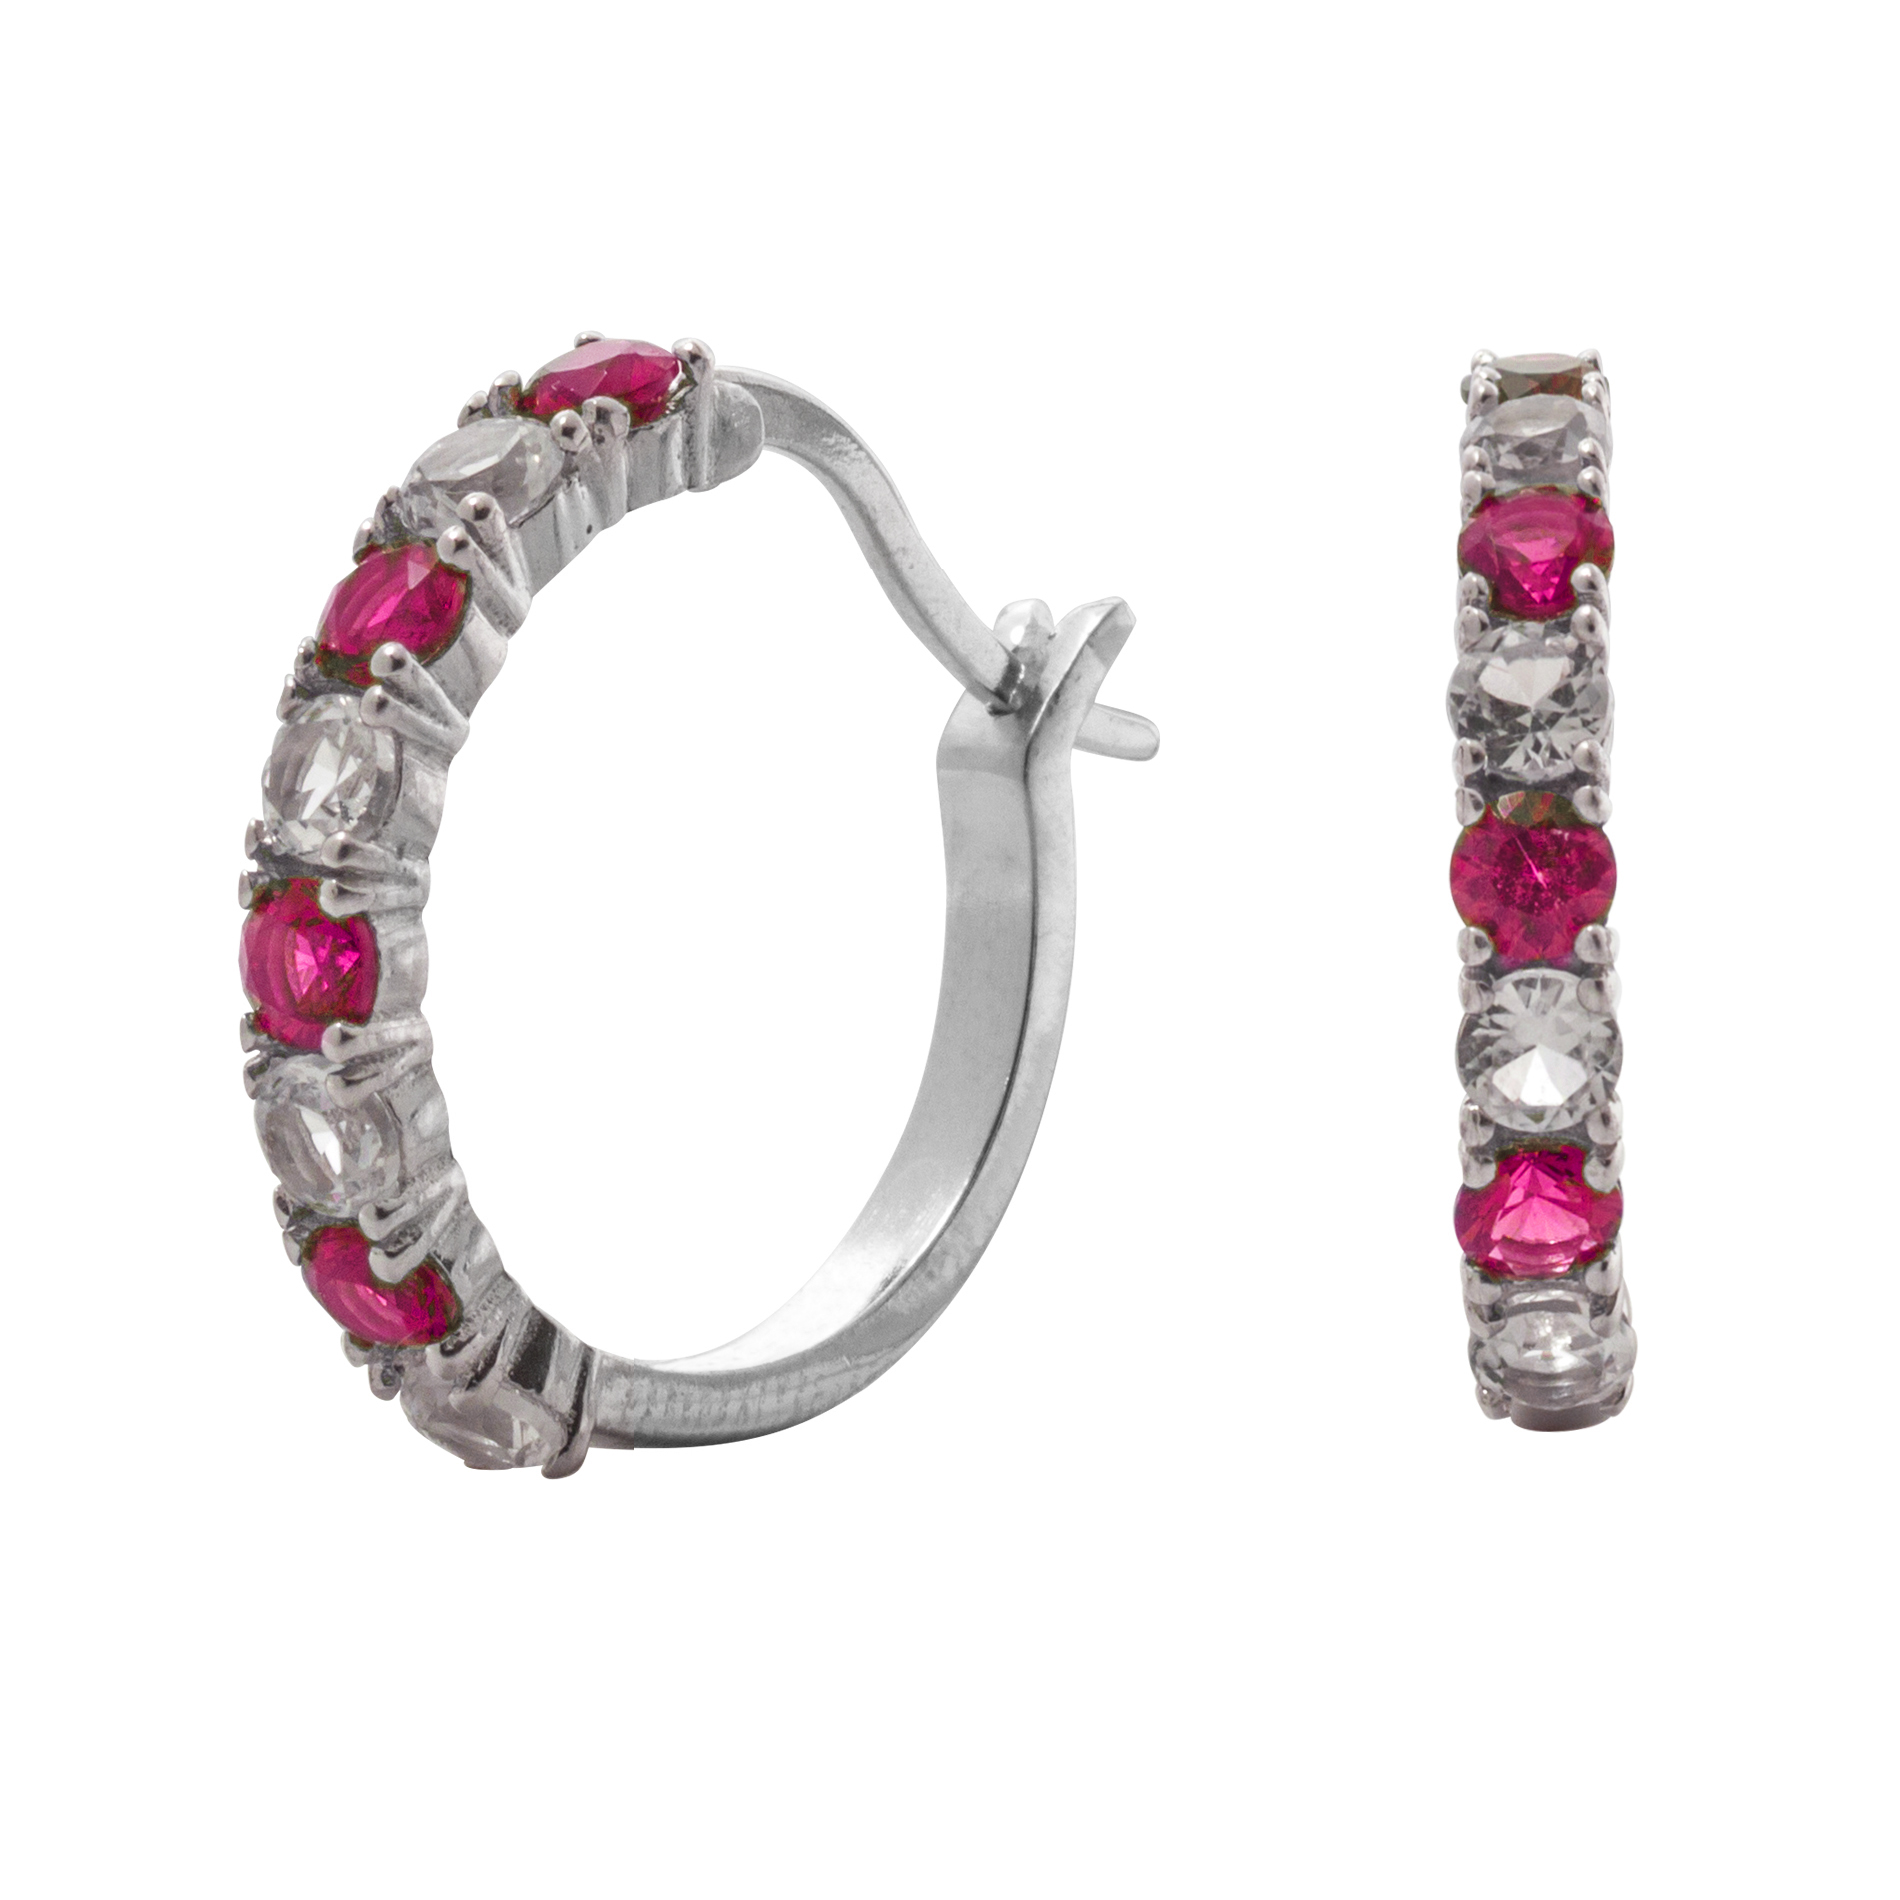 Permanent Hoop Earrings Jewelry